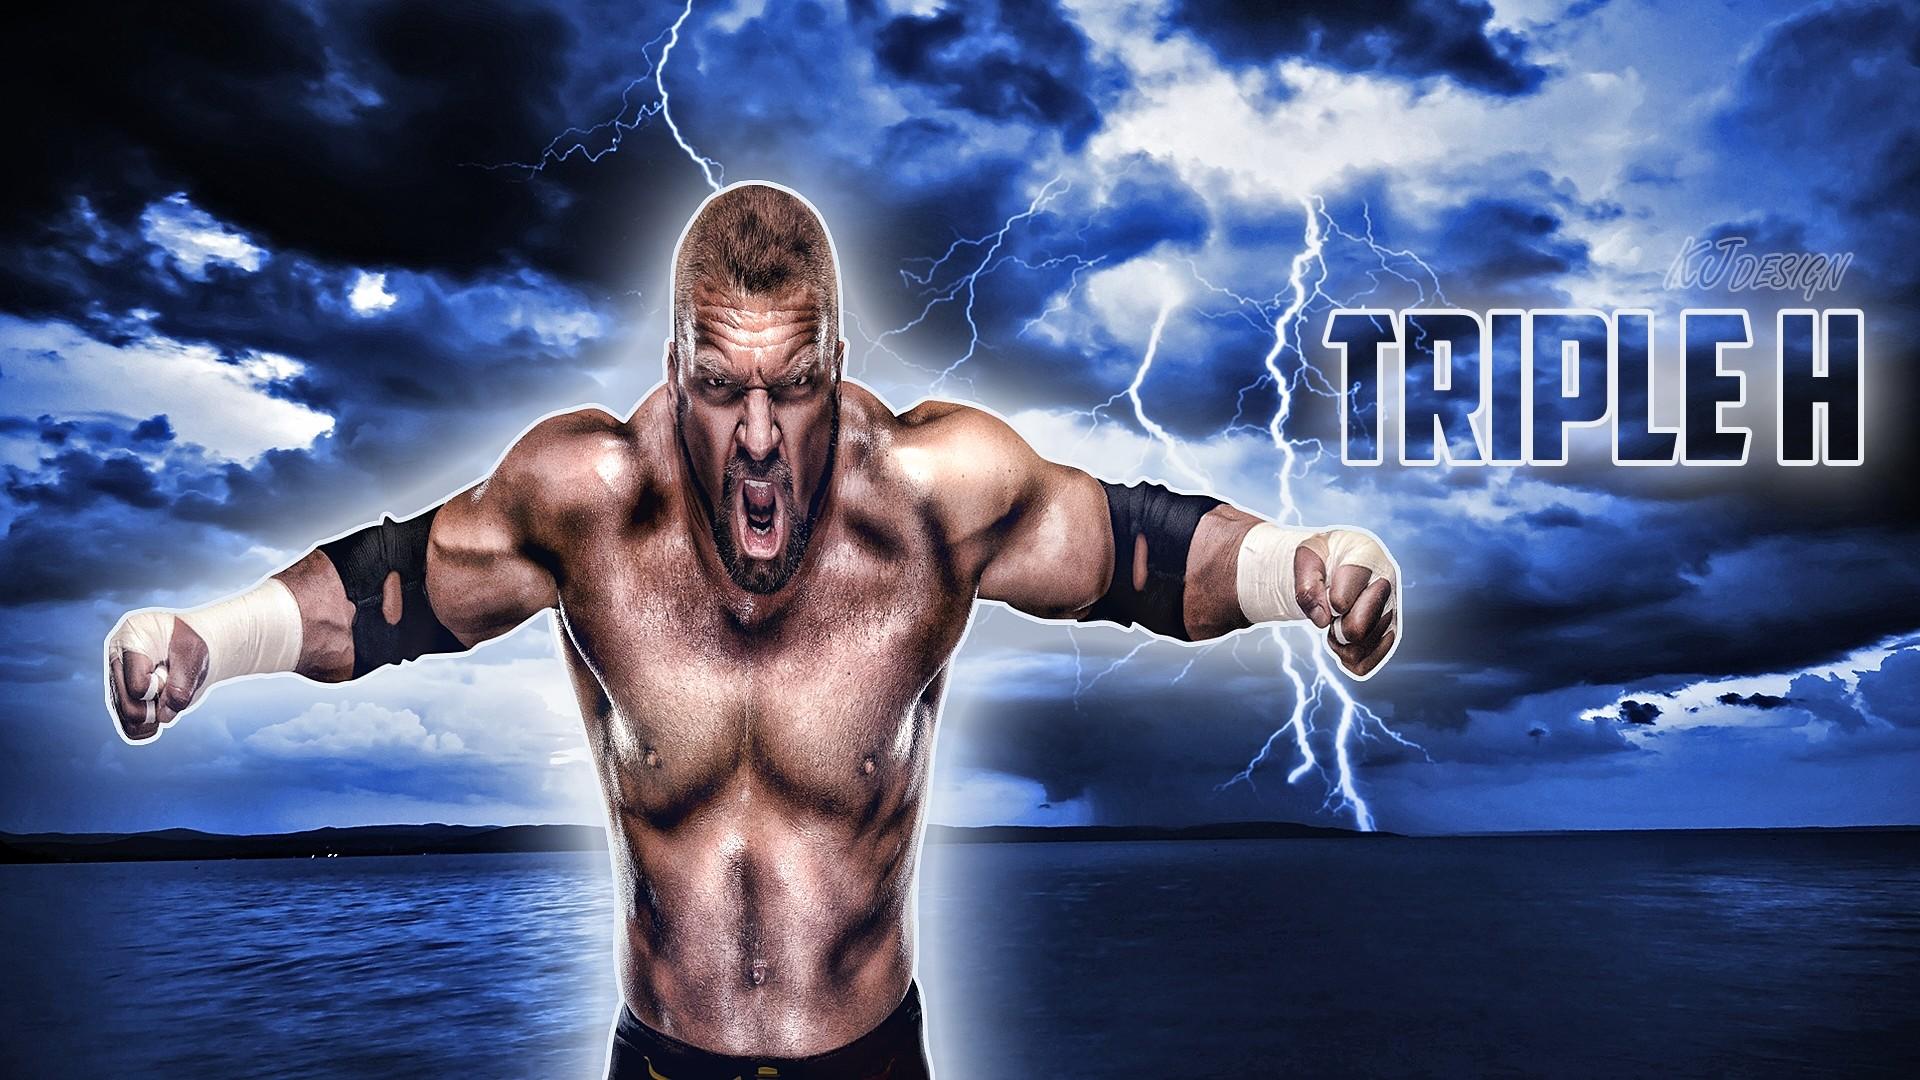 Triple H Hd Wallpapers Free Download   WWE HD WALLPAPER FREE DOWNLOAD